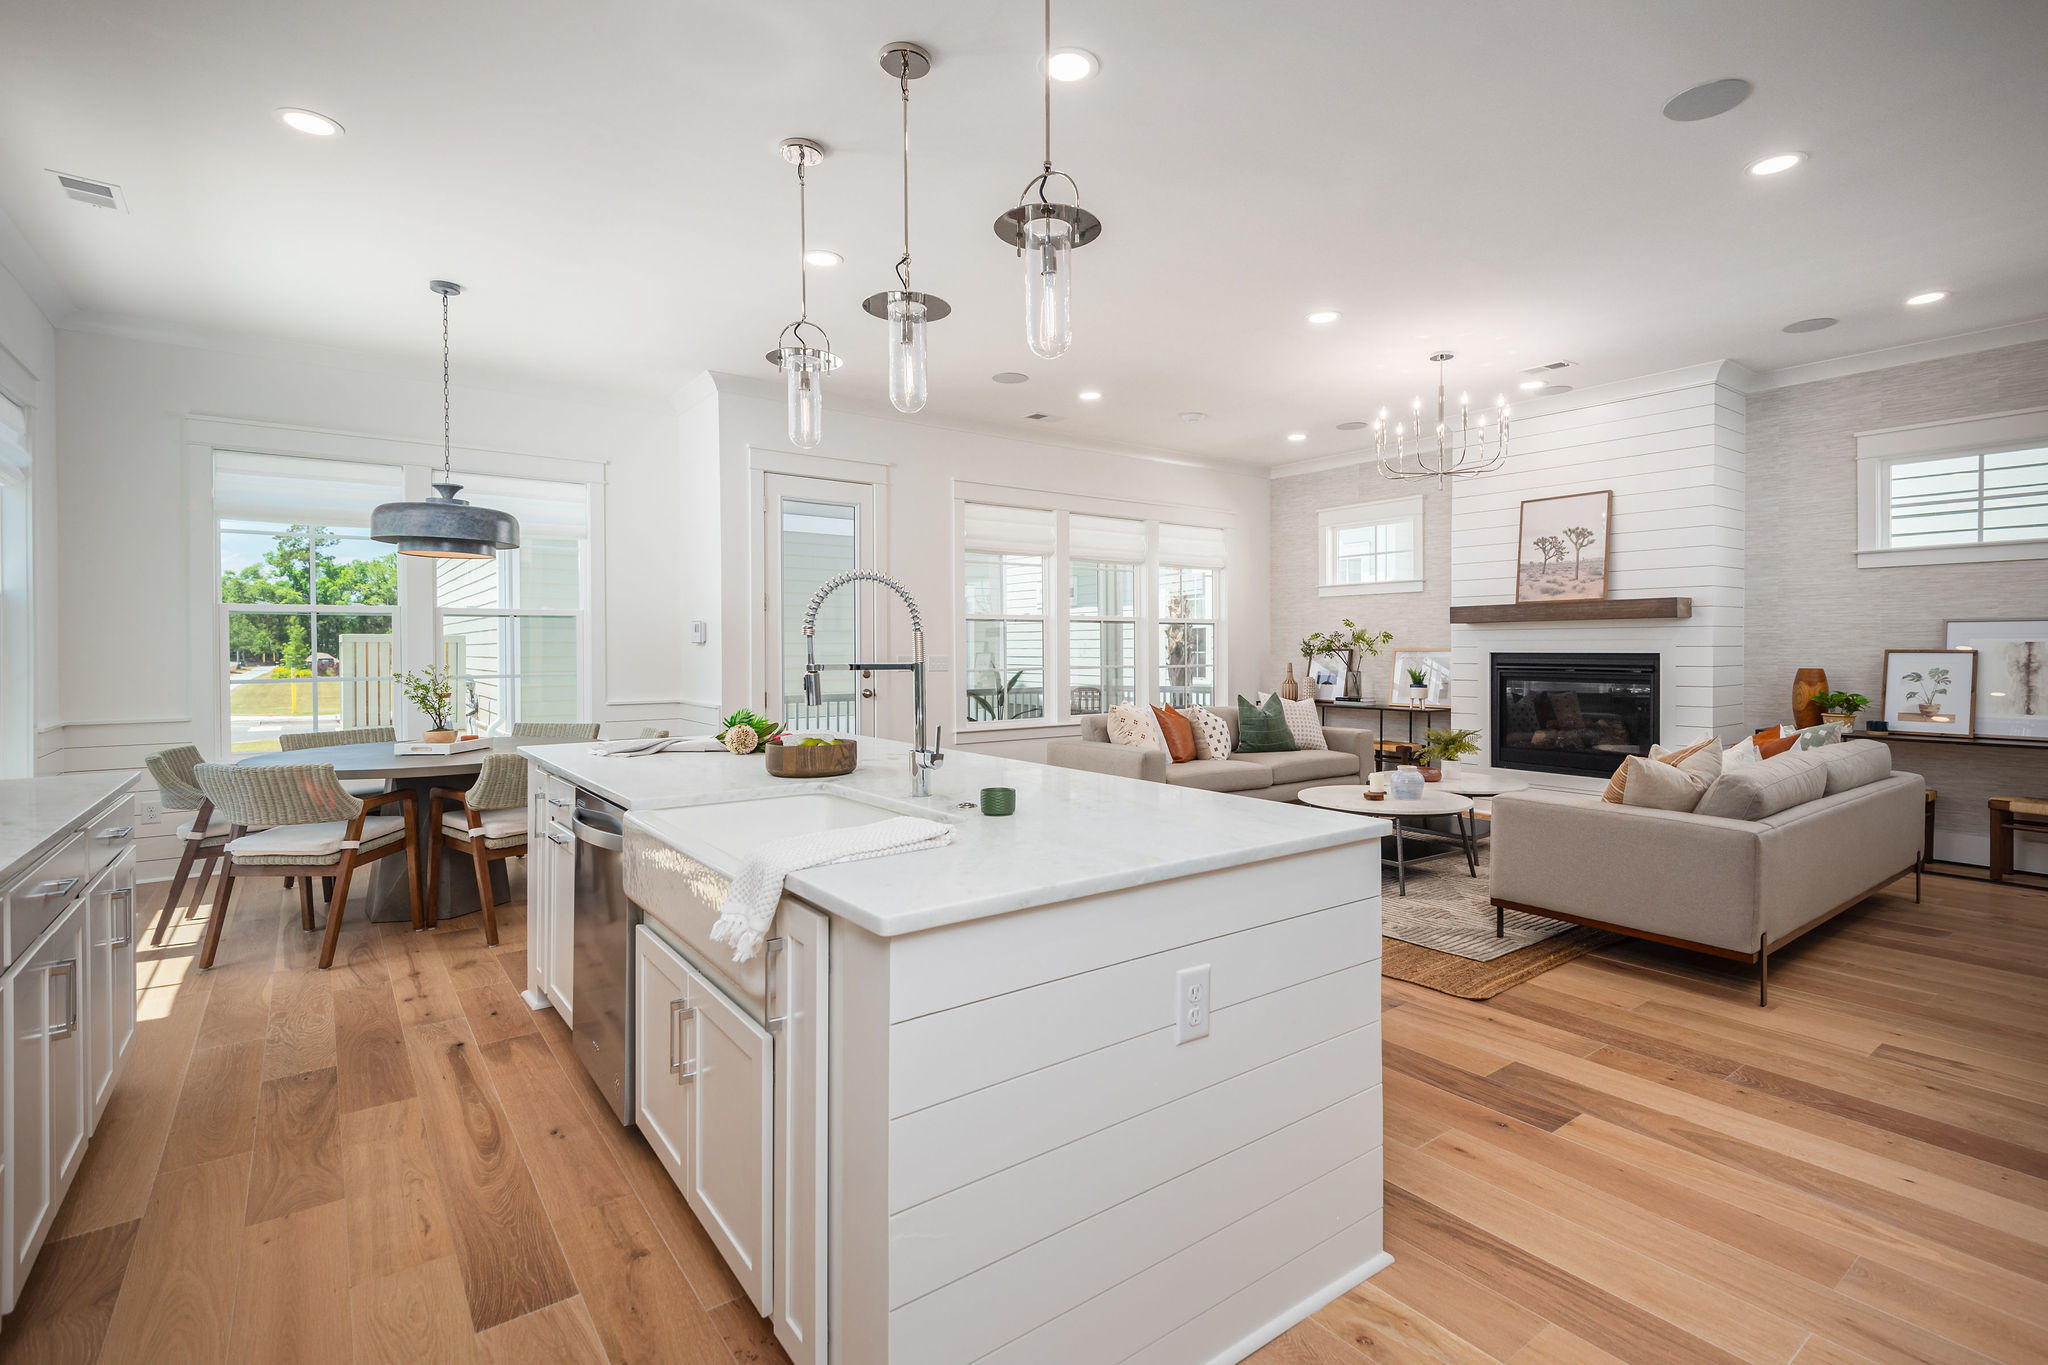 Midtown Homes For Sale - 1533 Kepley, Mount Pleasant, SC - 32